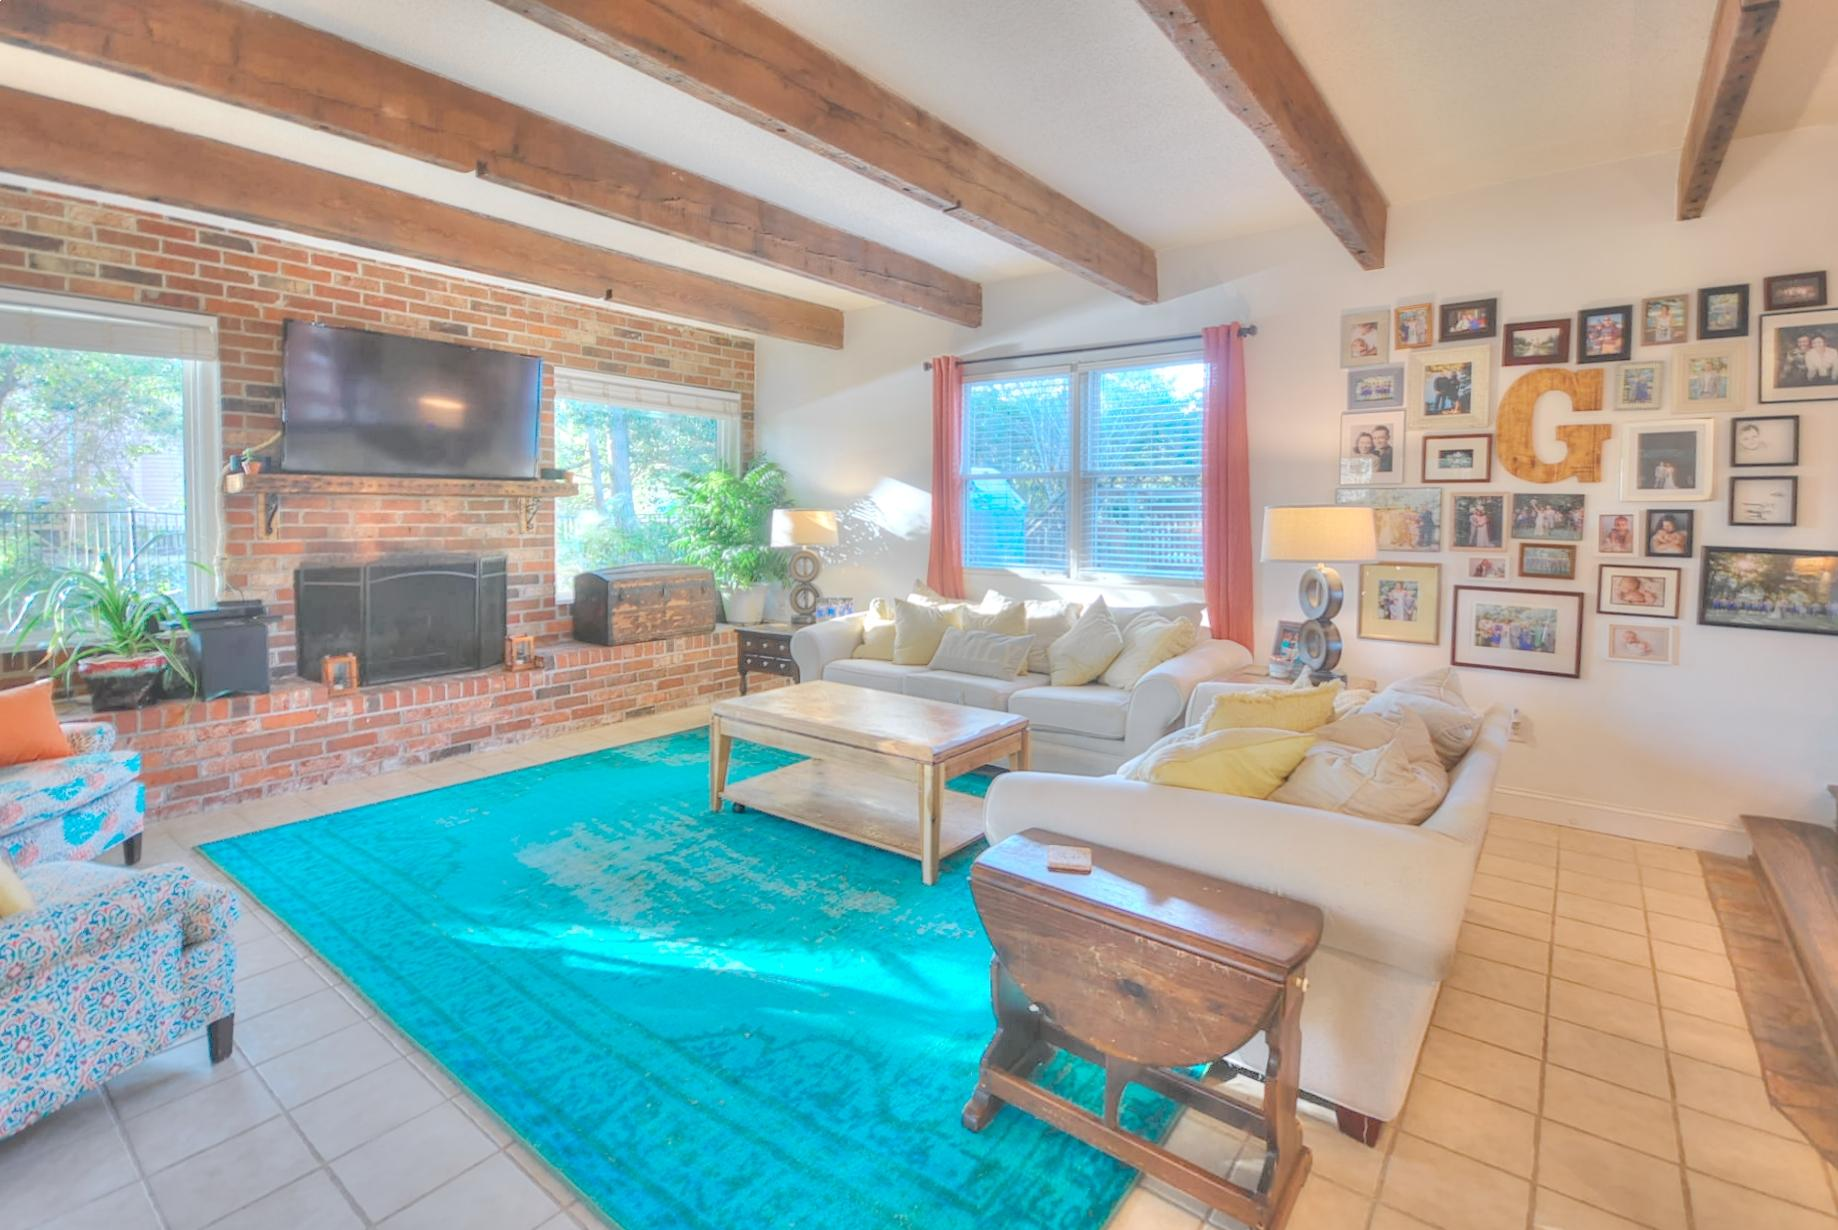 Capri Isles Homes For Sale - 213 Wappoo, Charleston, SC - 30